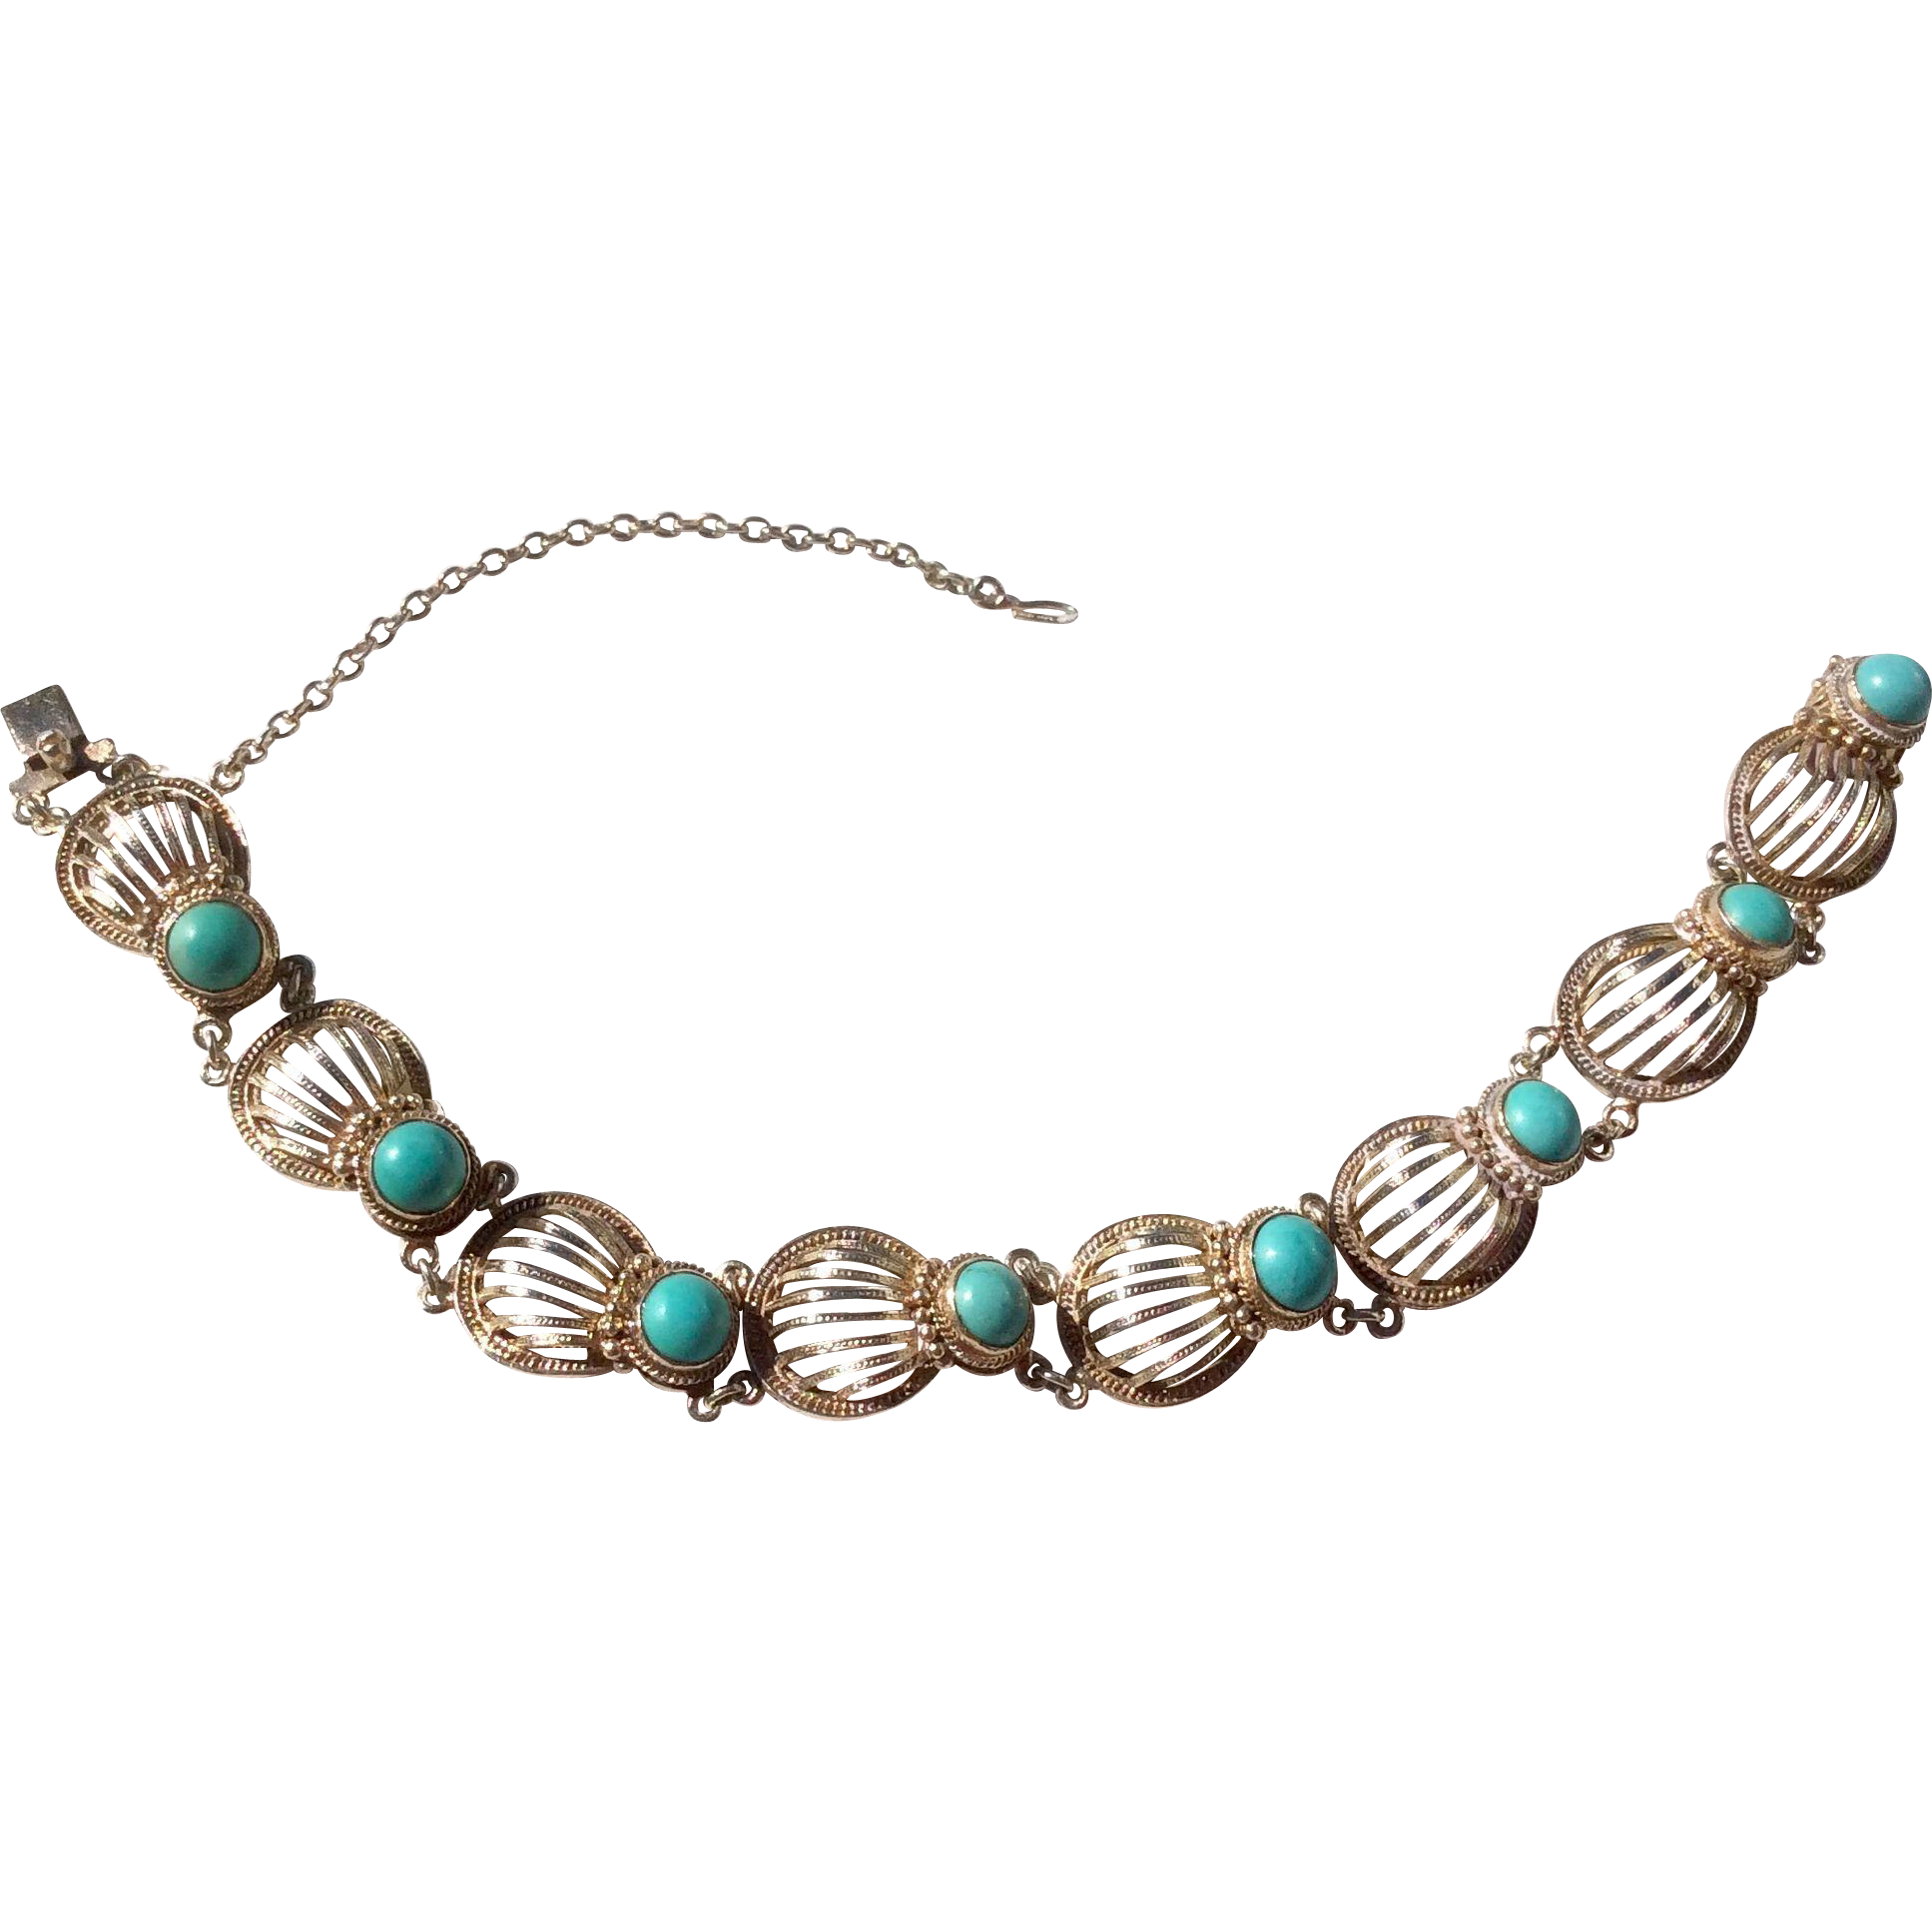 Asian Jewelry In Denver - Asian - Photo Xxx-4593